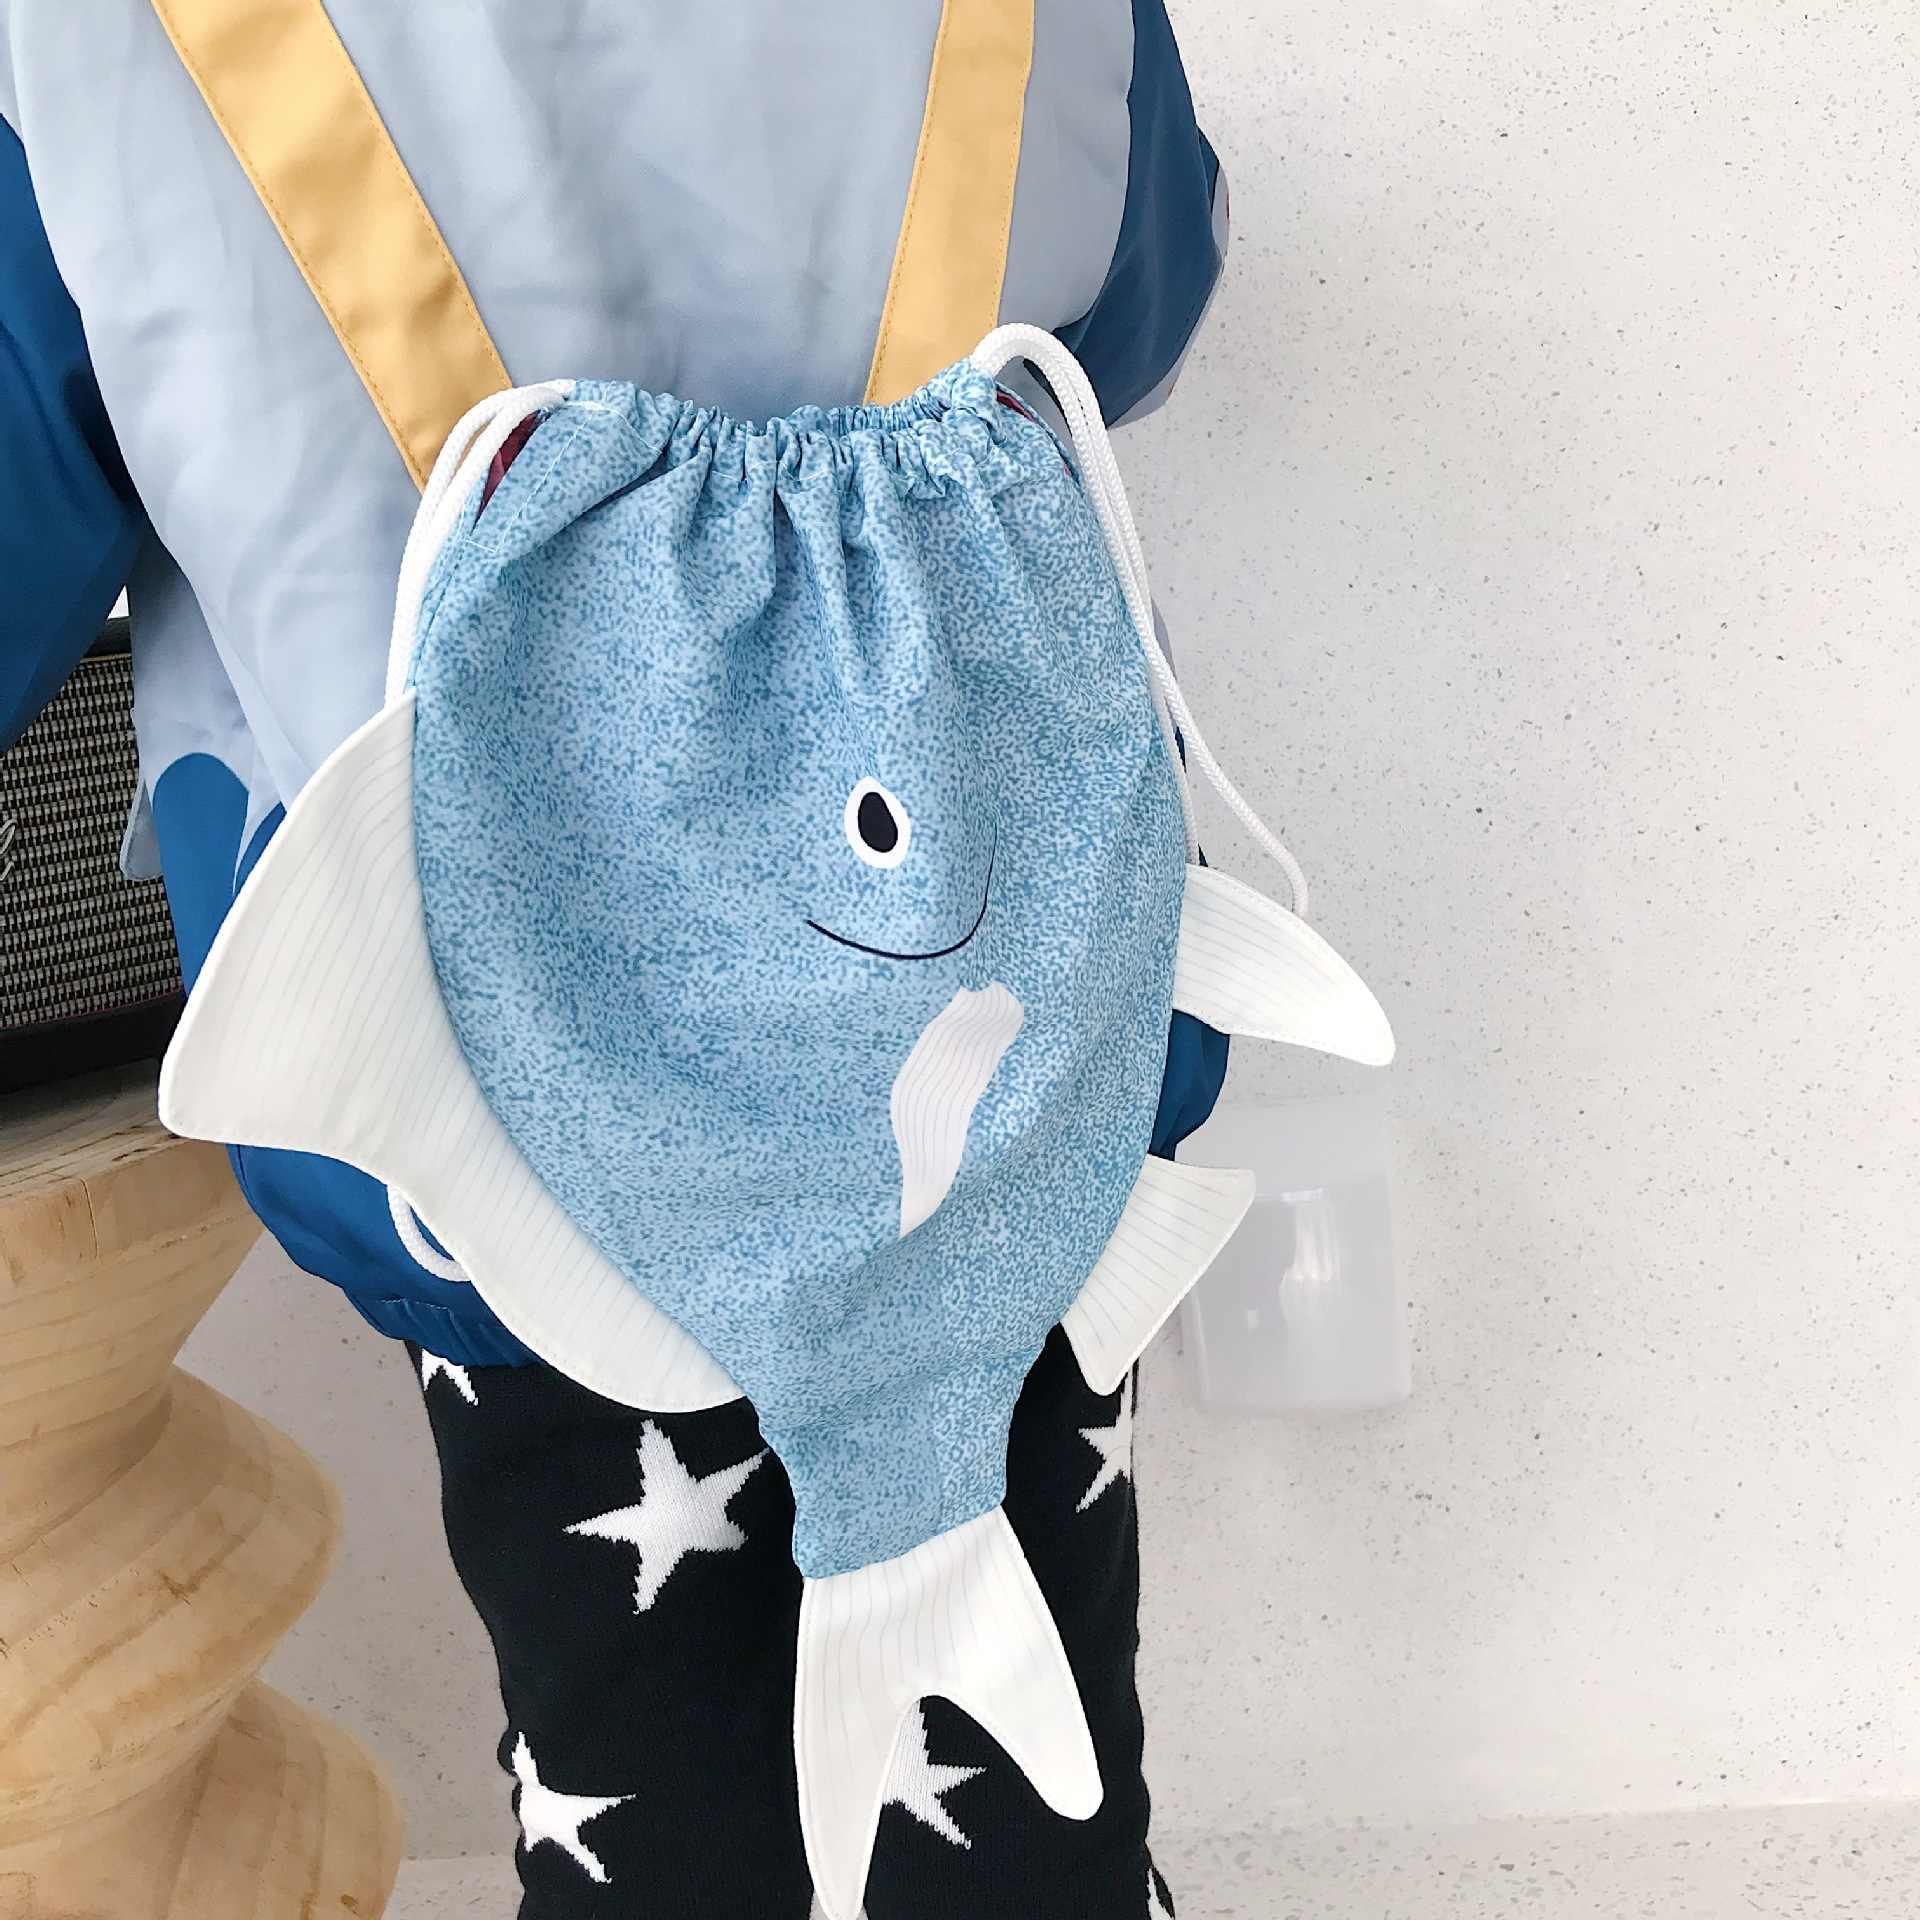 Tonytaobaby 新冬服少年少女漫画青魚キャップ子供のベルベット